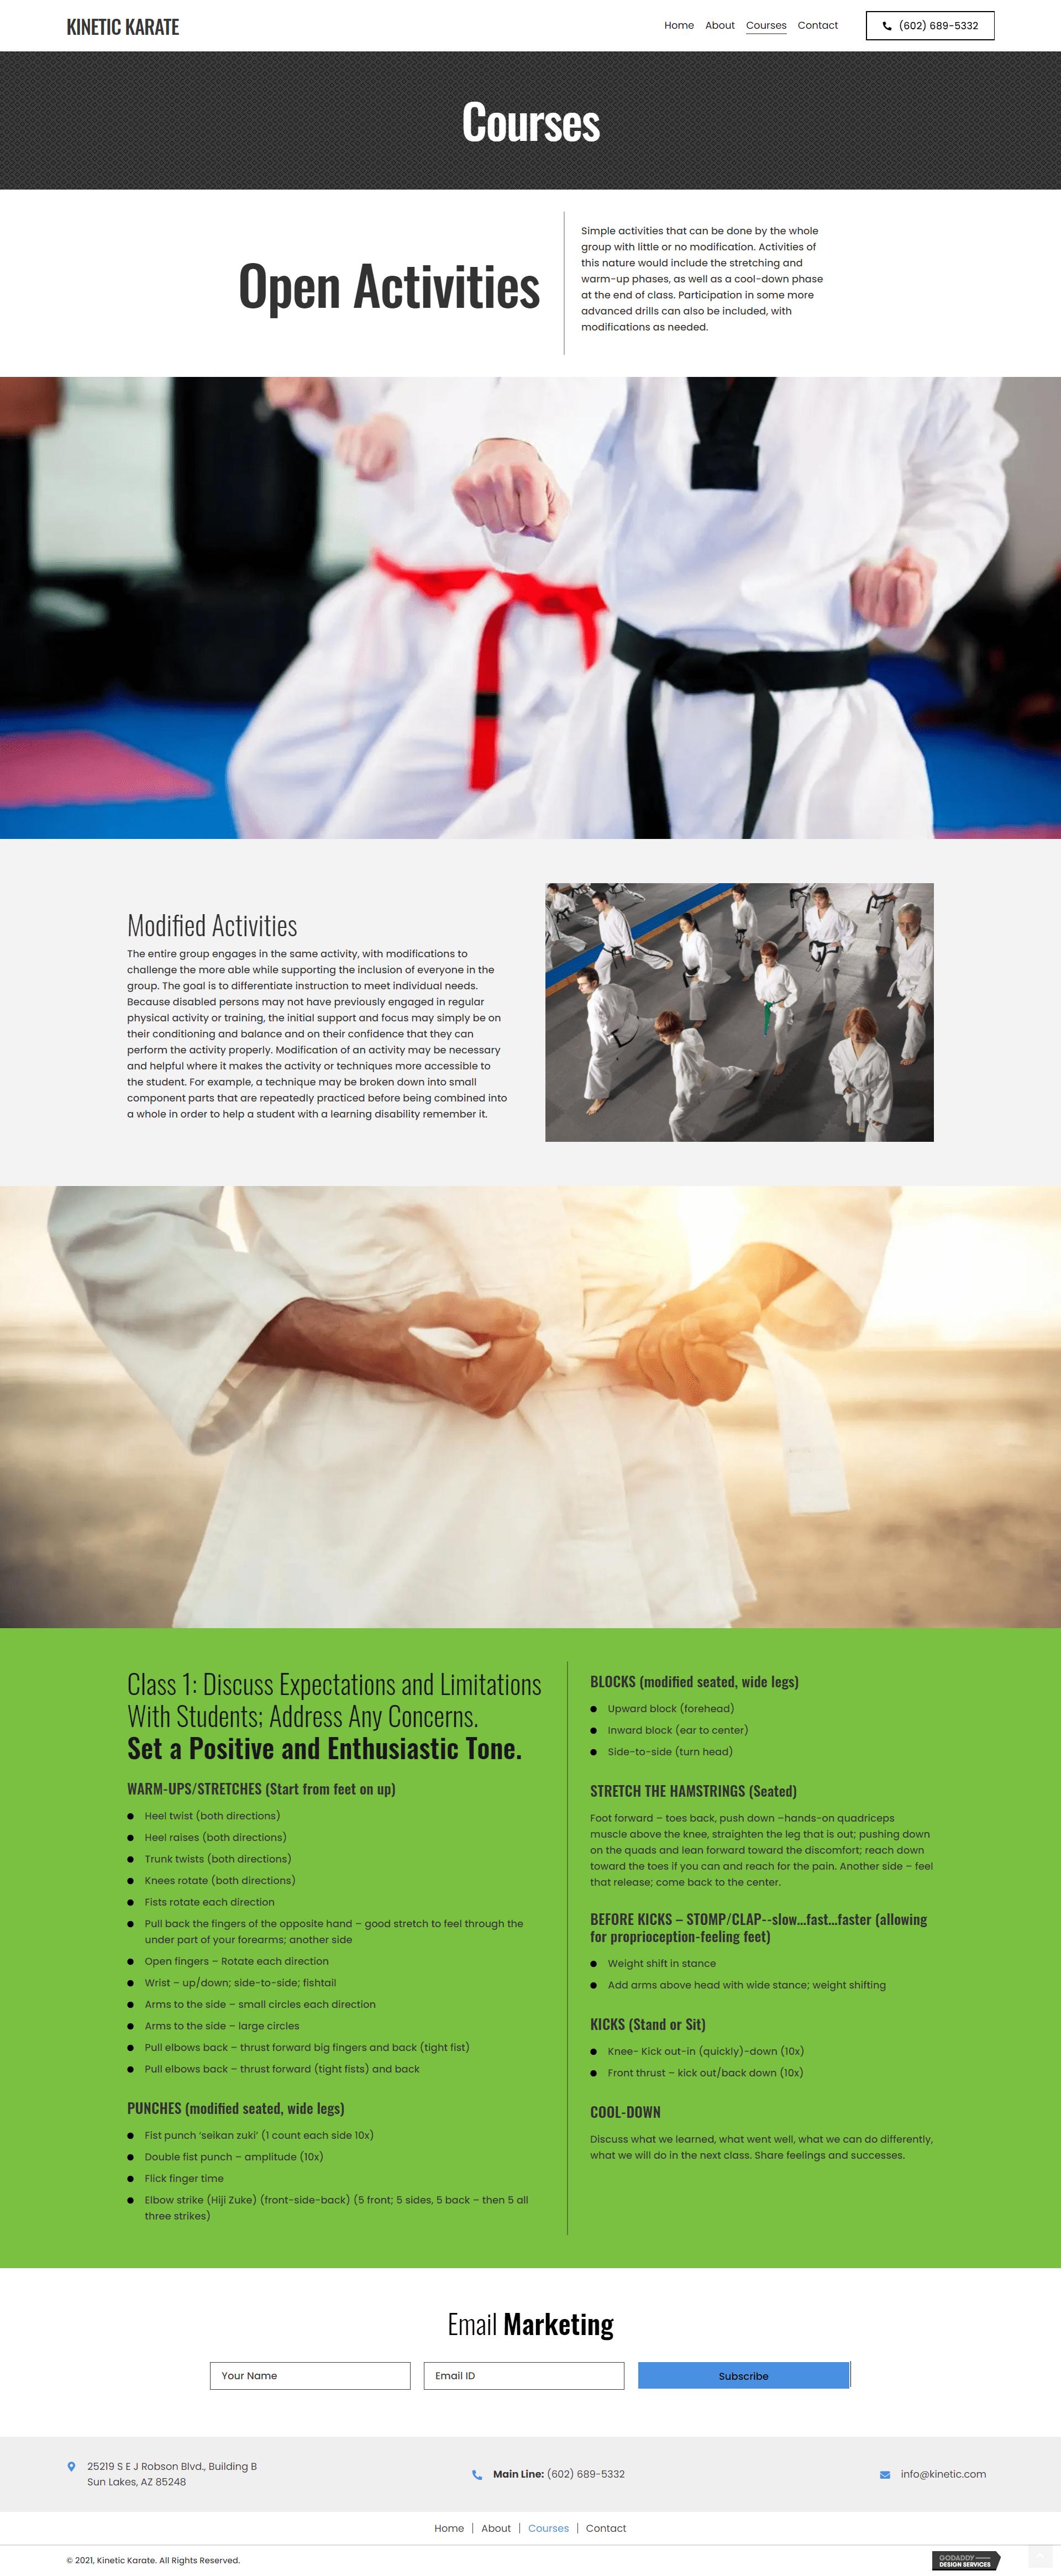 Kinetic Karate Courses